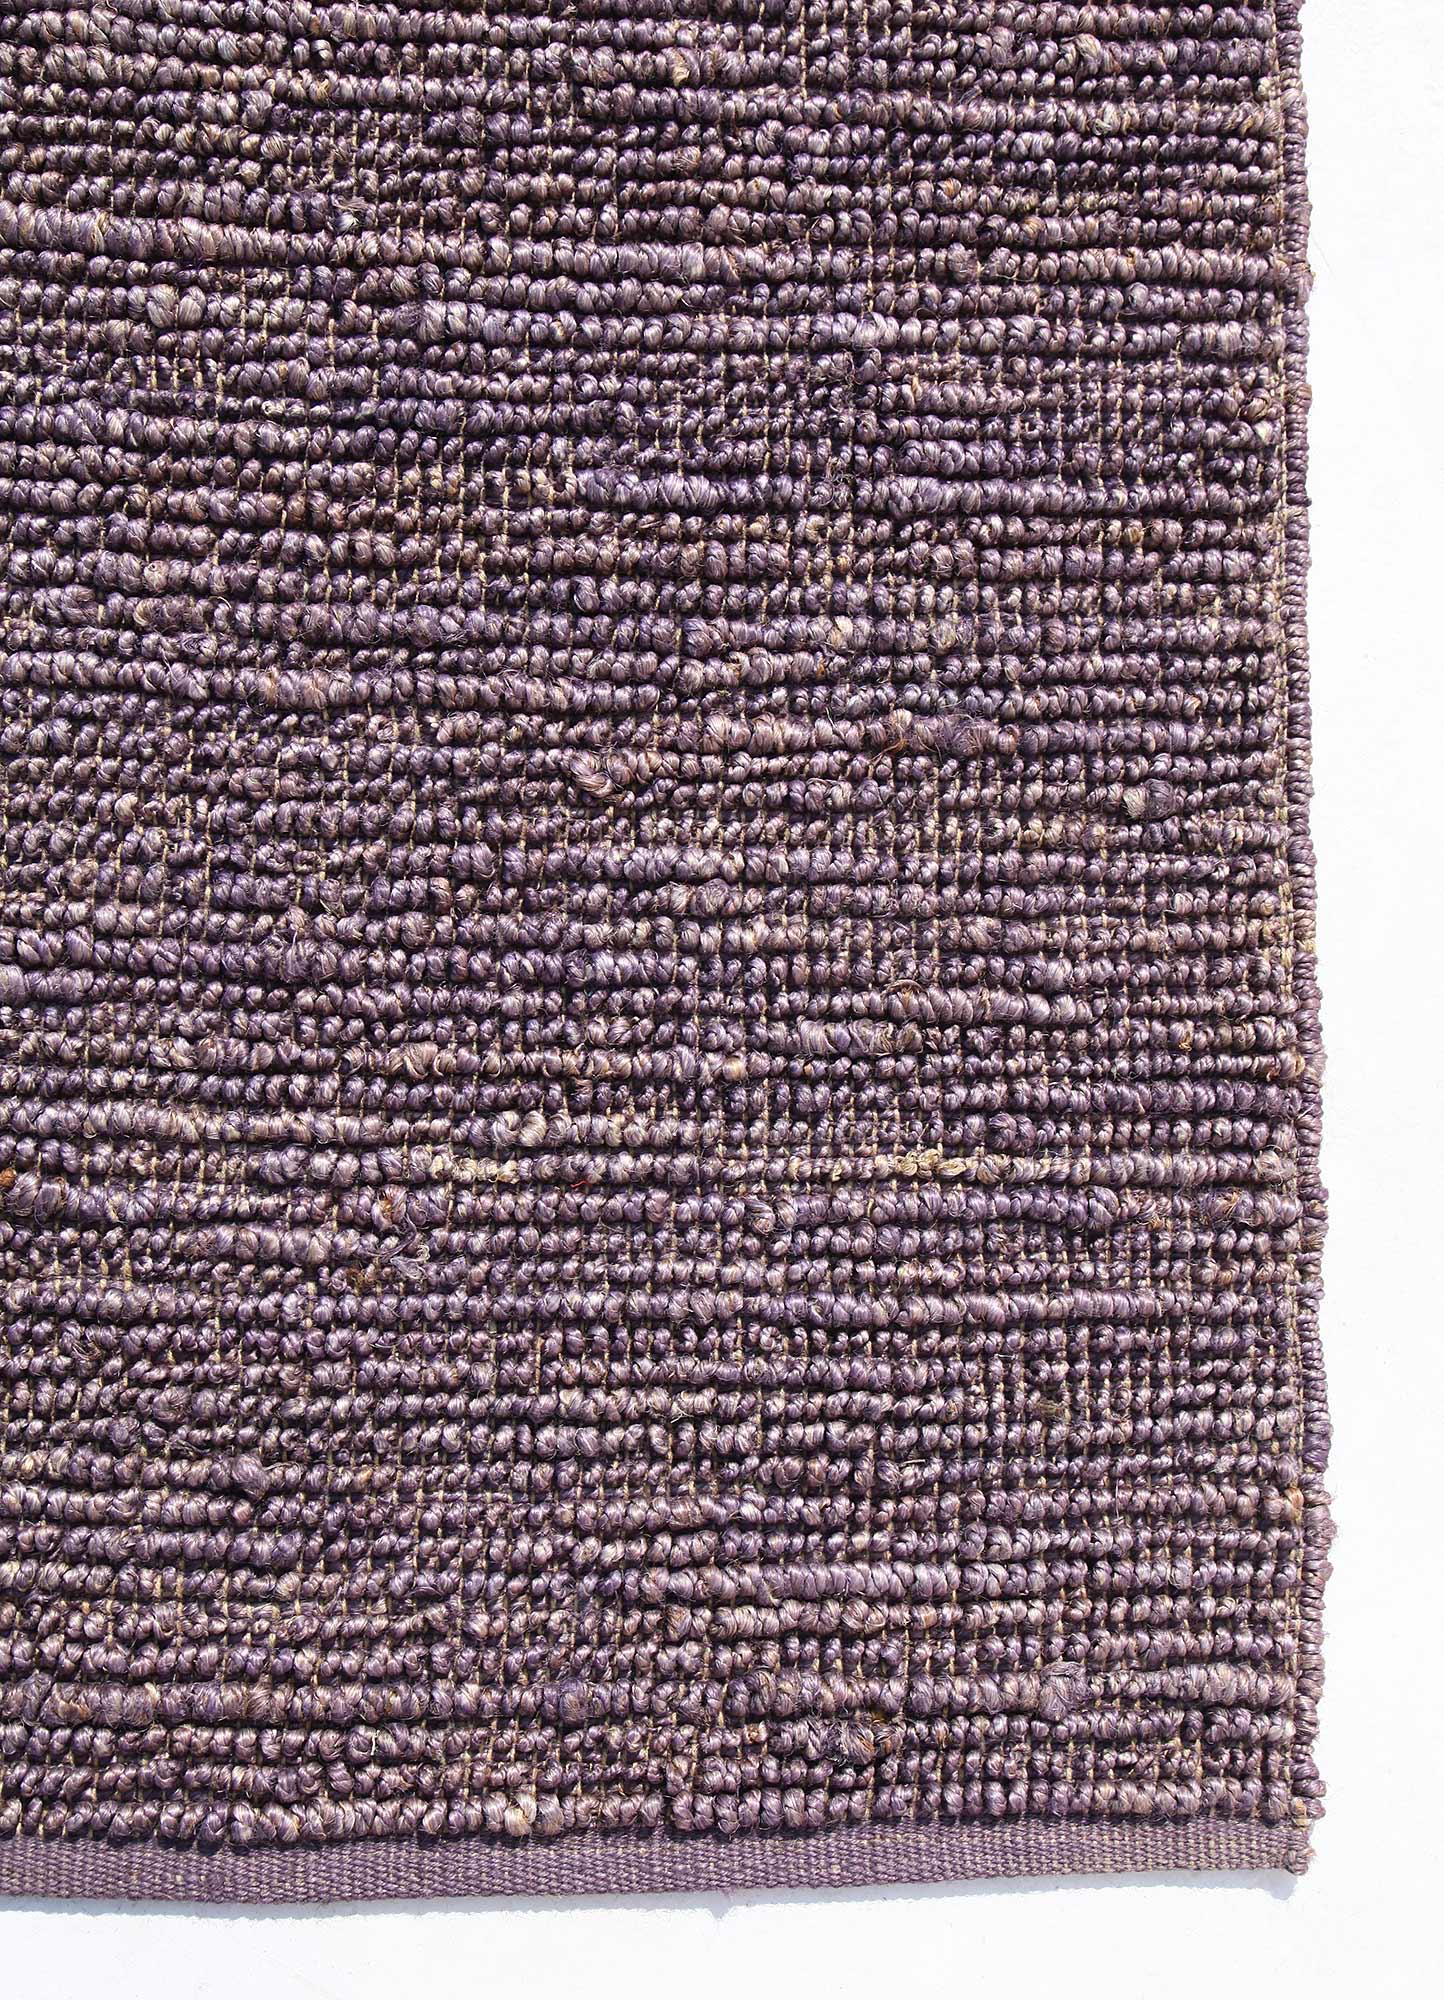 abrash pink and purple jute and hemp flat weaves Rug - Corner